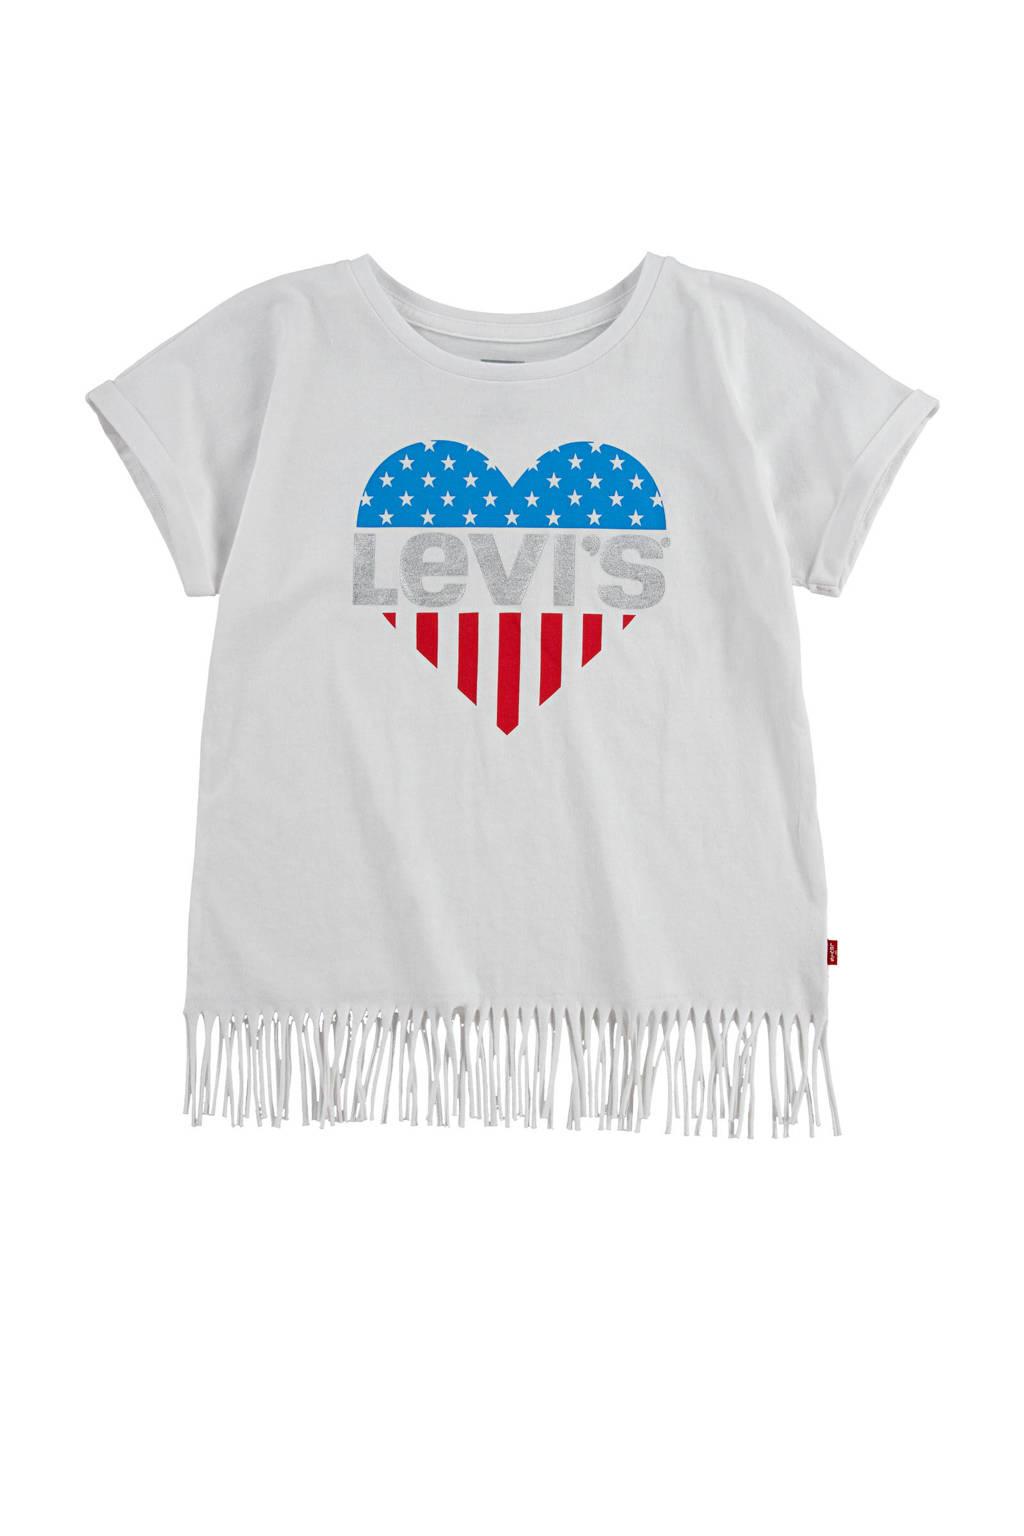 Levi's Kids T-shirt met logo en franjes wit/rood/blauw, Wit/rood/blauw